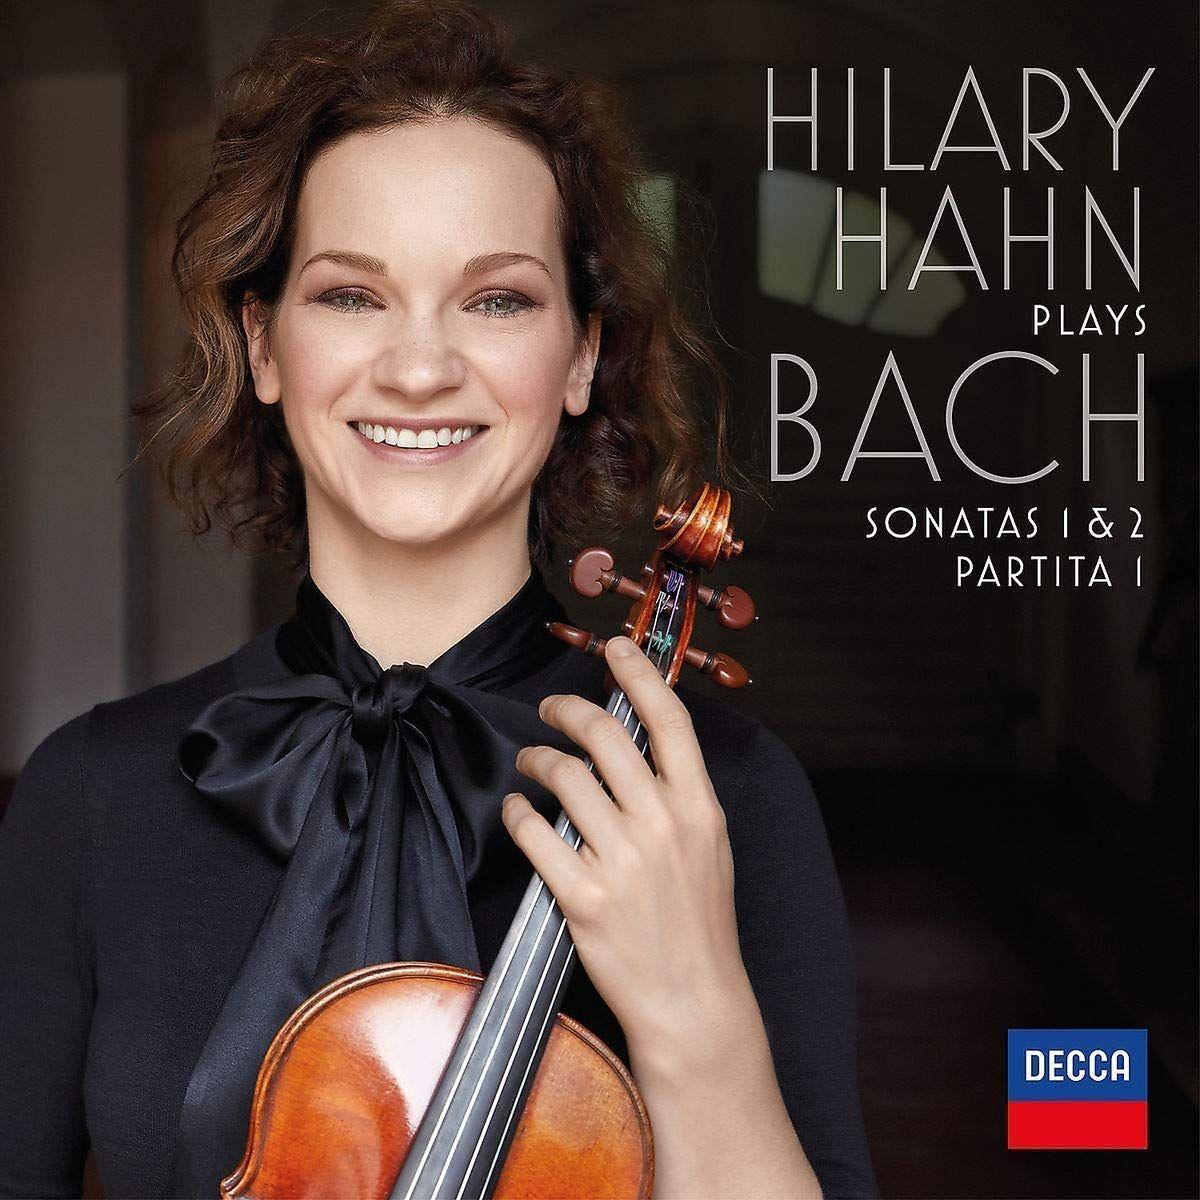 Хилари Хан Hilary Hahn. Bach: Violin Sonatas Nos. 1 & 2; Partita No. 1 (2 LP) лара лев lara lev bach sonatas and partitas for solo violin vol 1